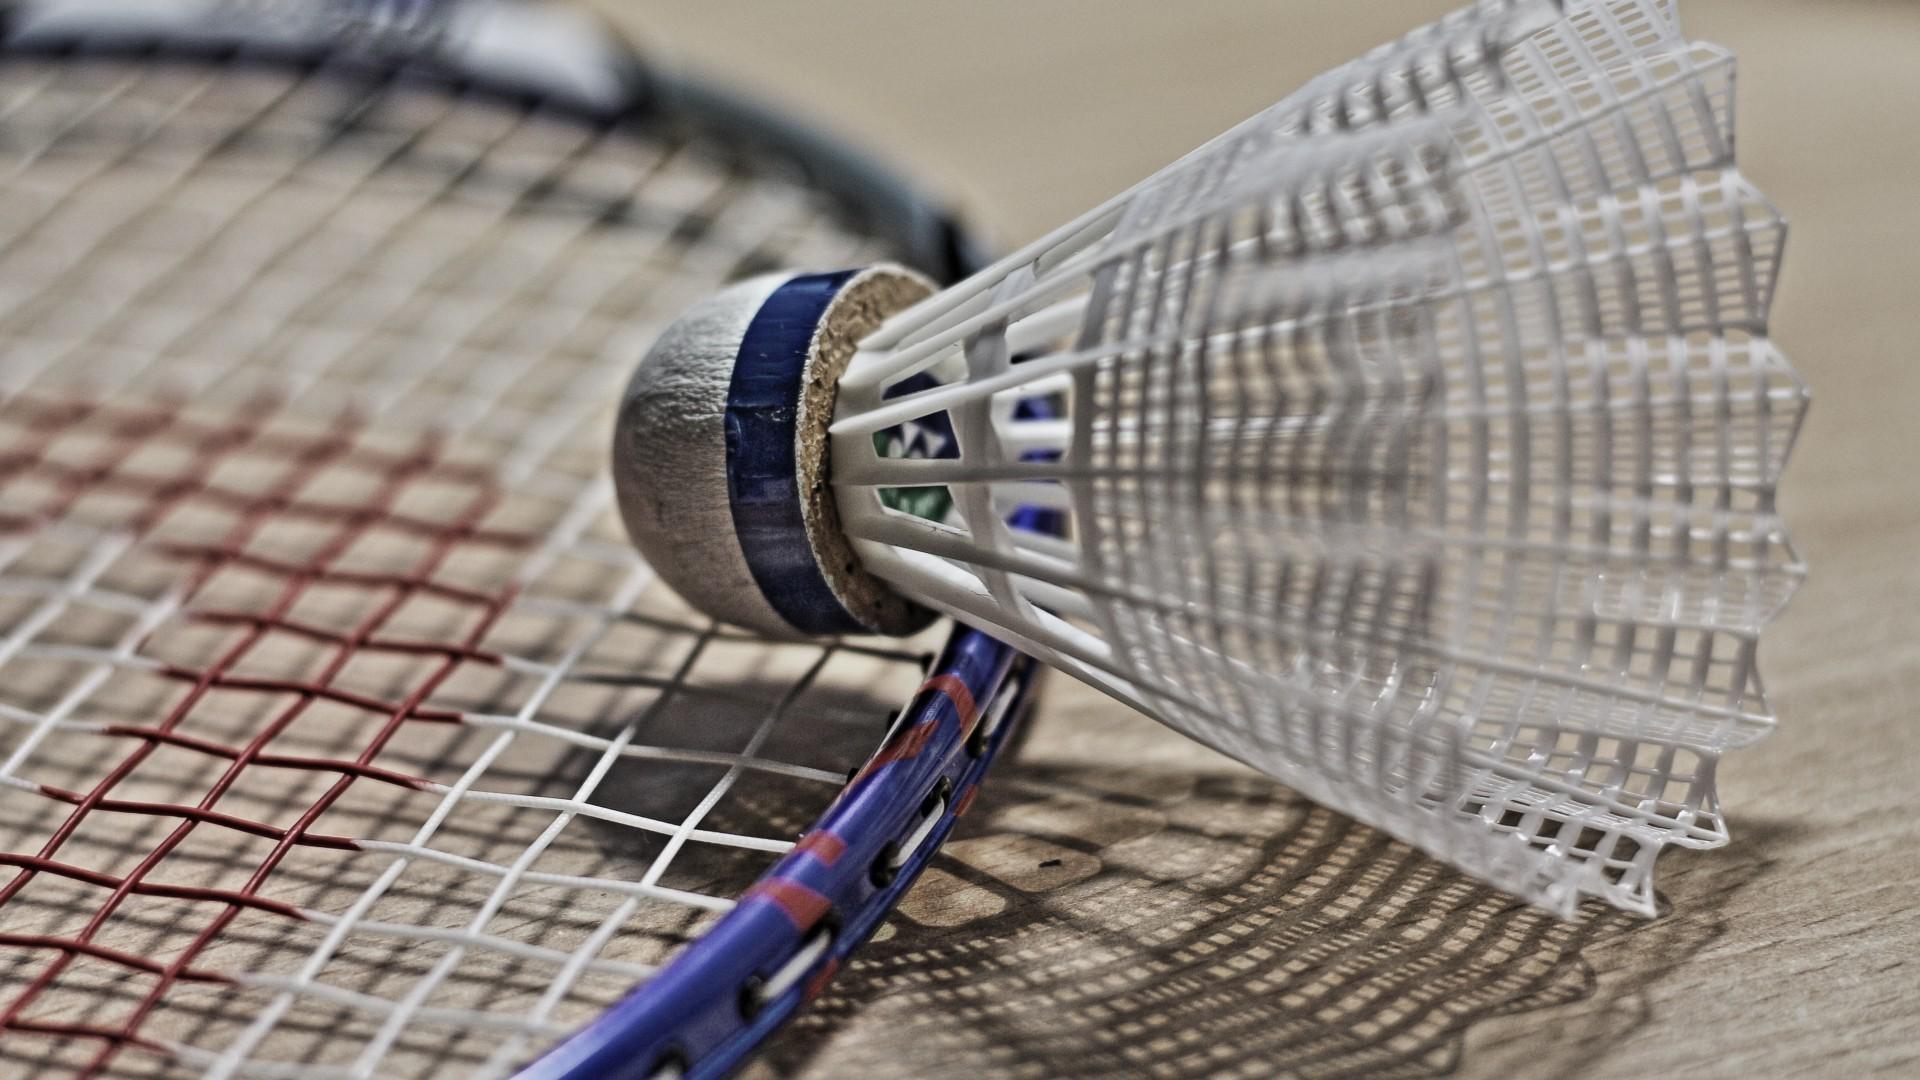 https://badminton.gr/wp-content/uploads/2021/04/bad-pub-57.jpg